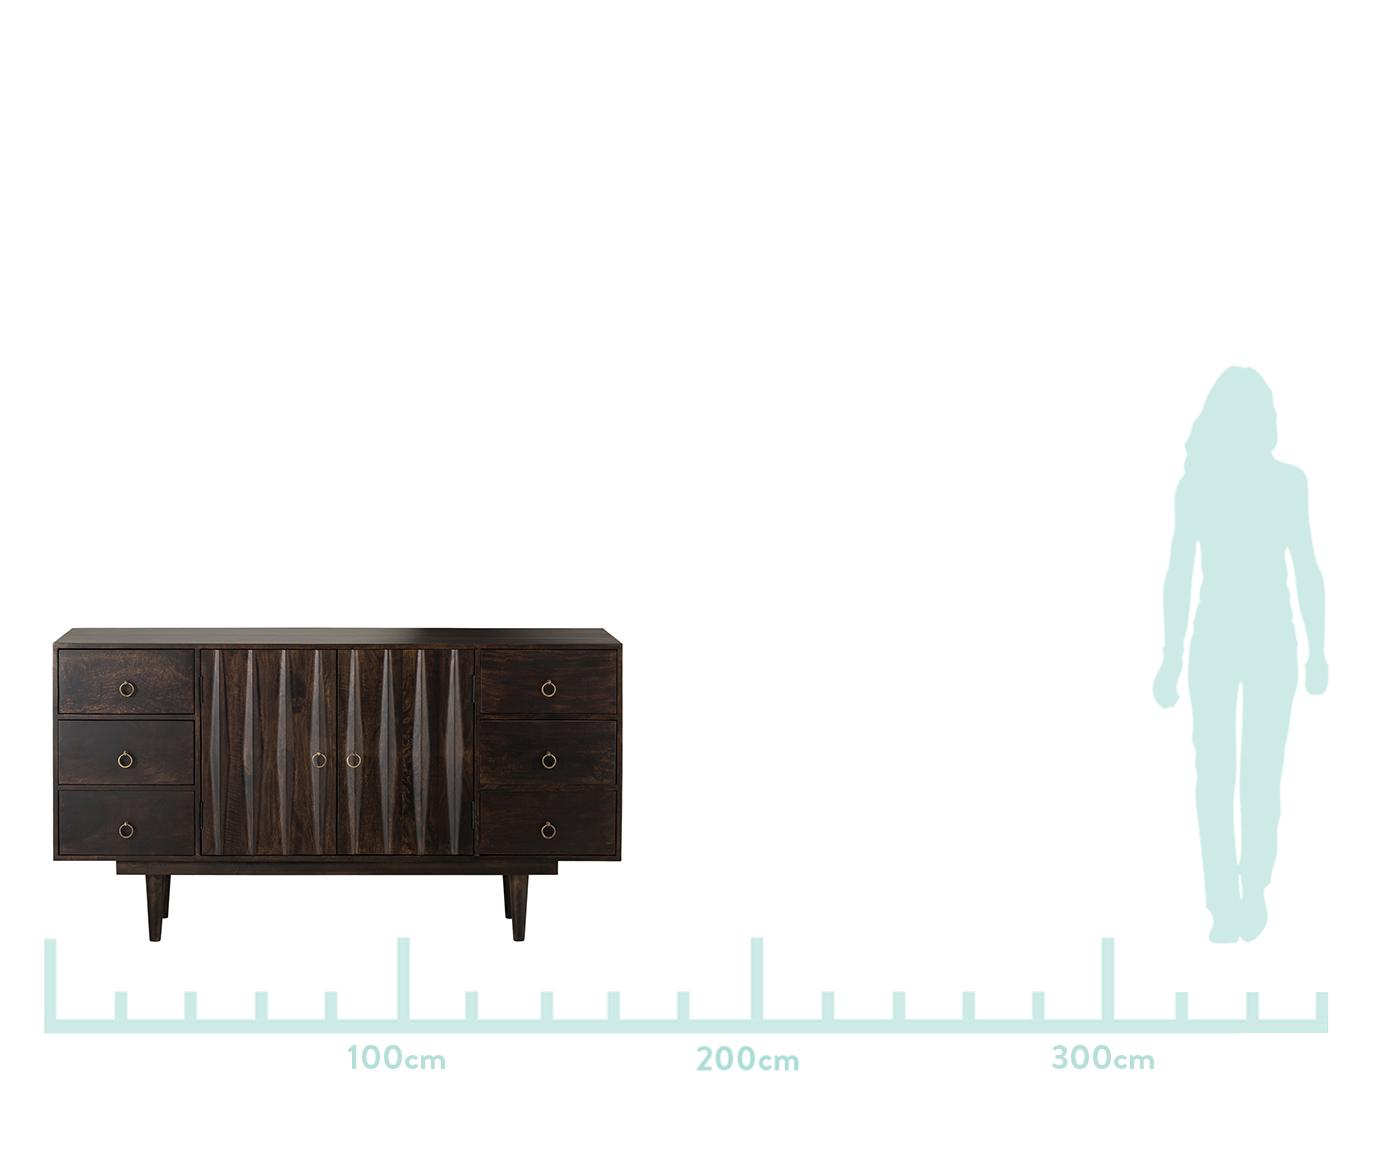 Komoda z litego drewna mangowego Kent, Korpus: masywne drewno mangowe, Korpus: drewno mangowe, błyszczący<br>Uchwyty: srebrny, S 160 x W 86 cm